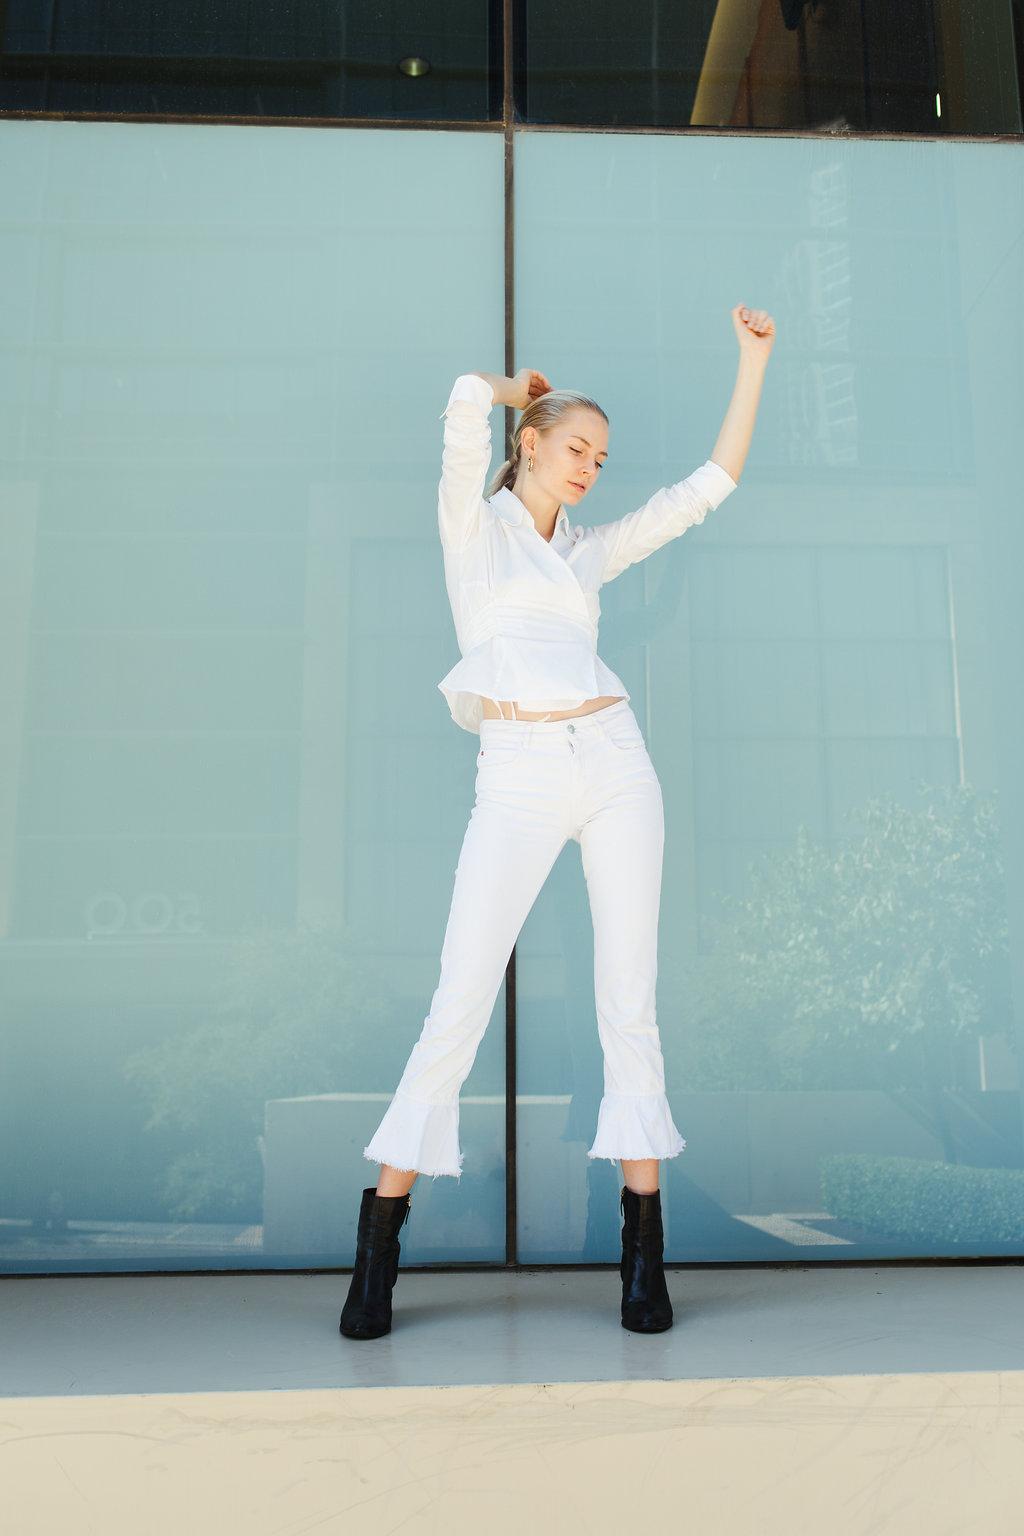 Paige-Newton-Austin-Model-Fashion-Photography0009.jpg